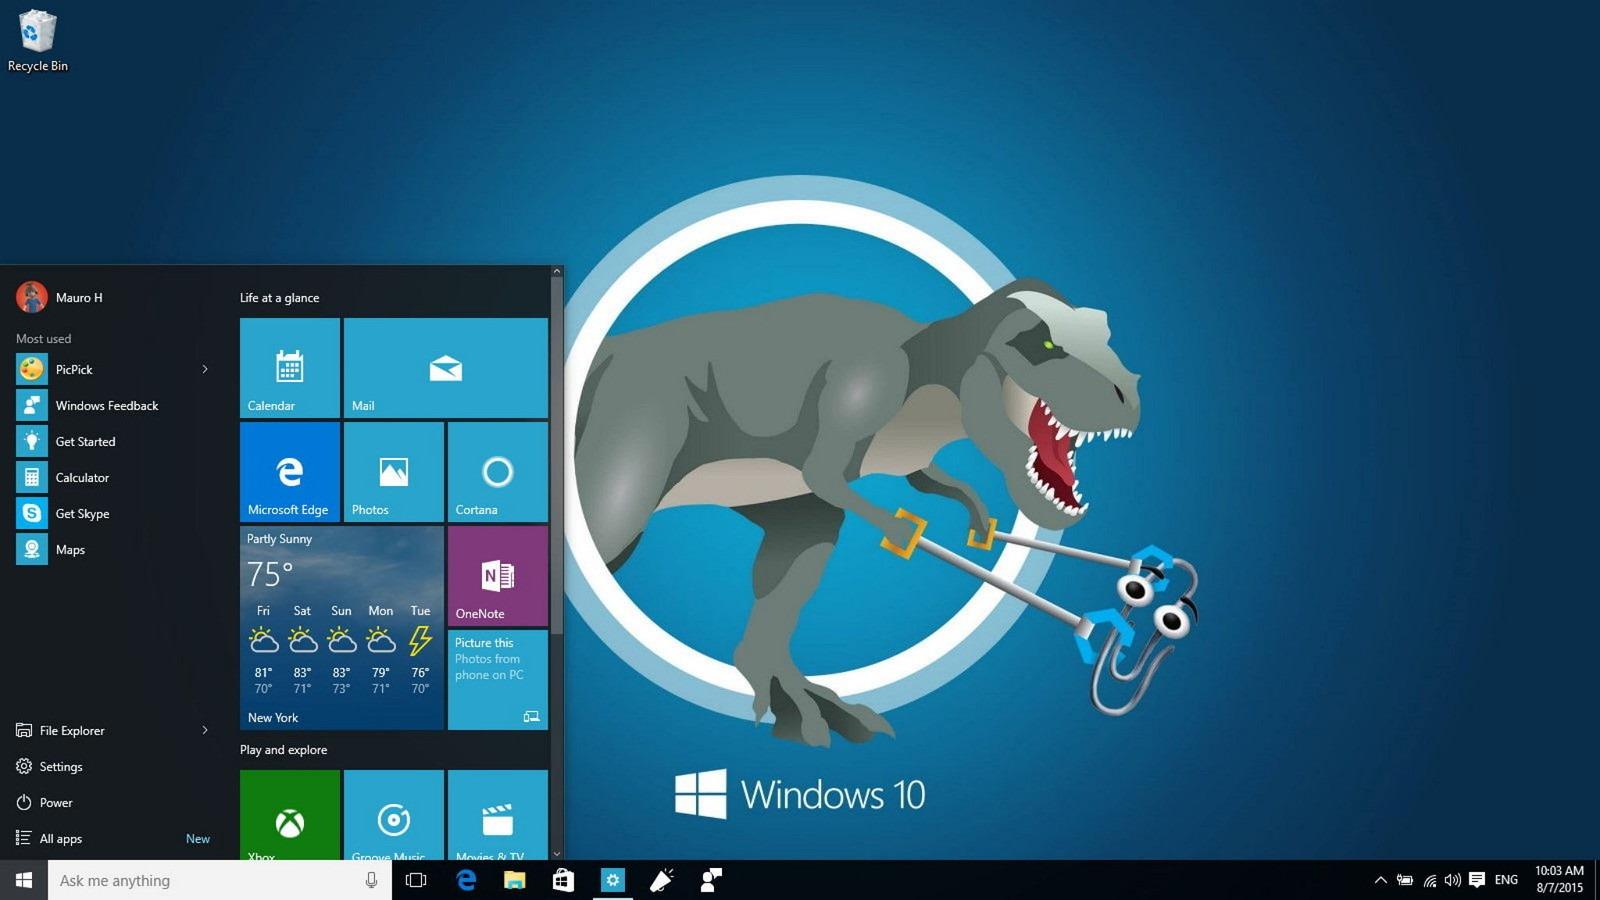 Actualize j o seu Windows 10 Segunda actualizao 1600x900